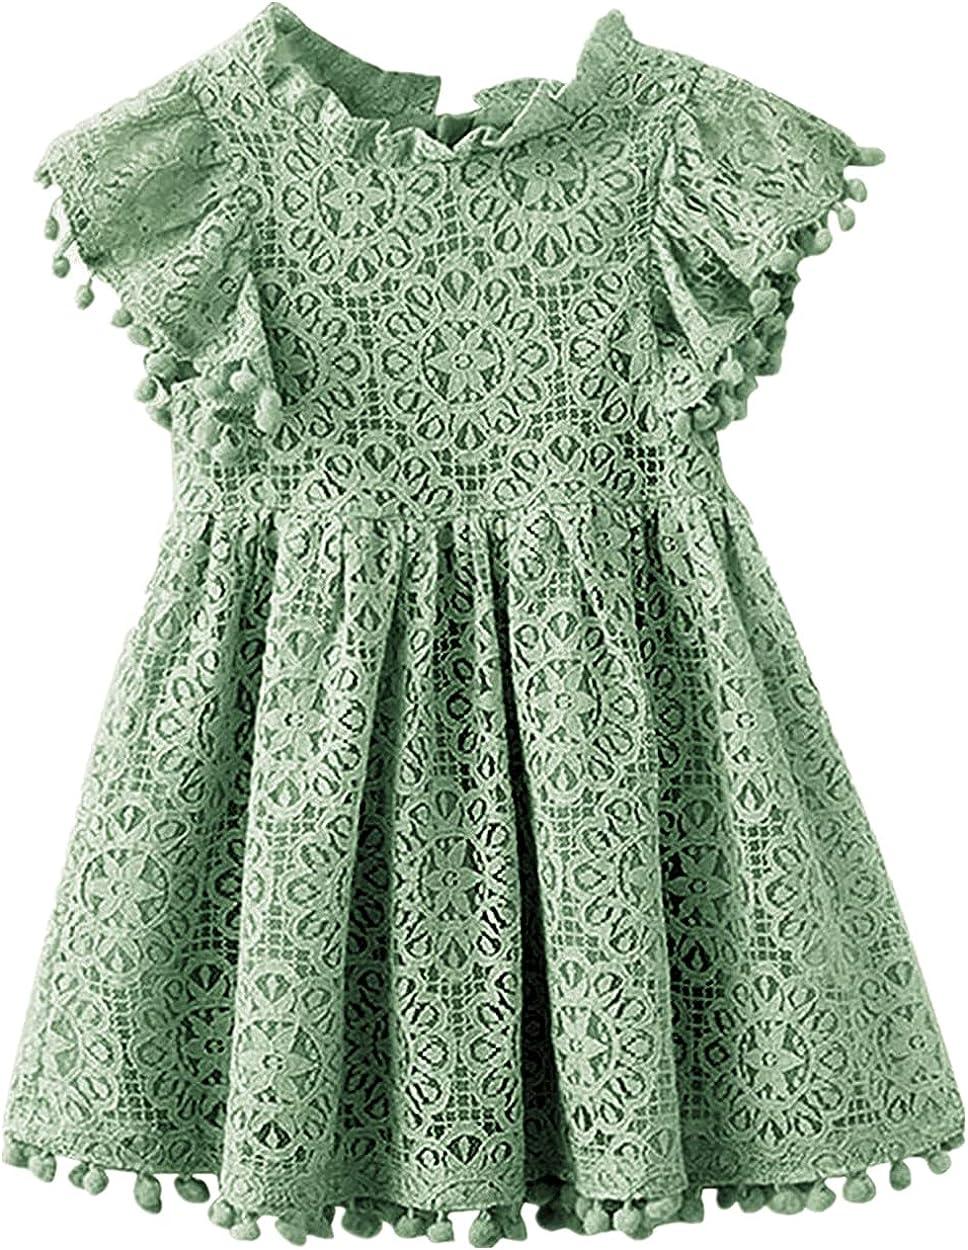 2Bunnies Girl Vintage Lace Boho Party Princess Flower Girl Dress